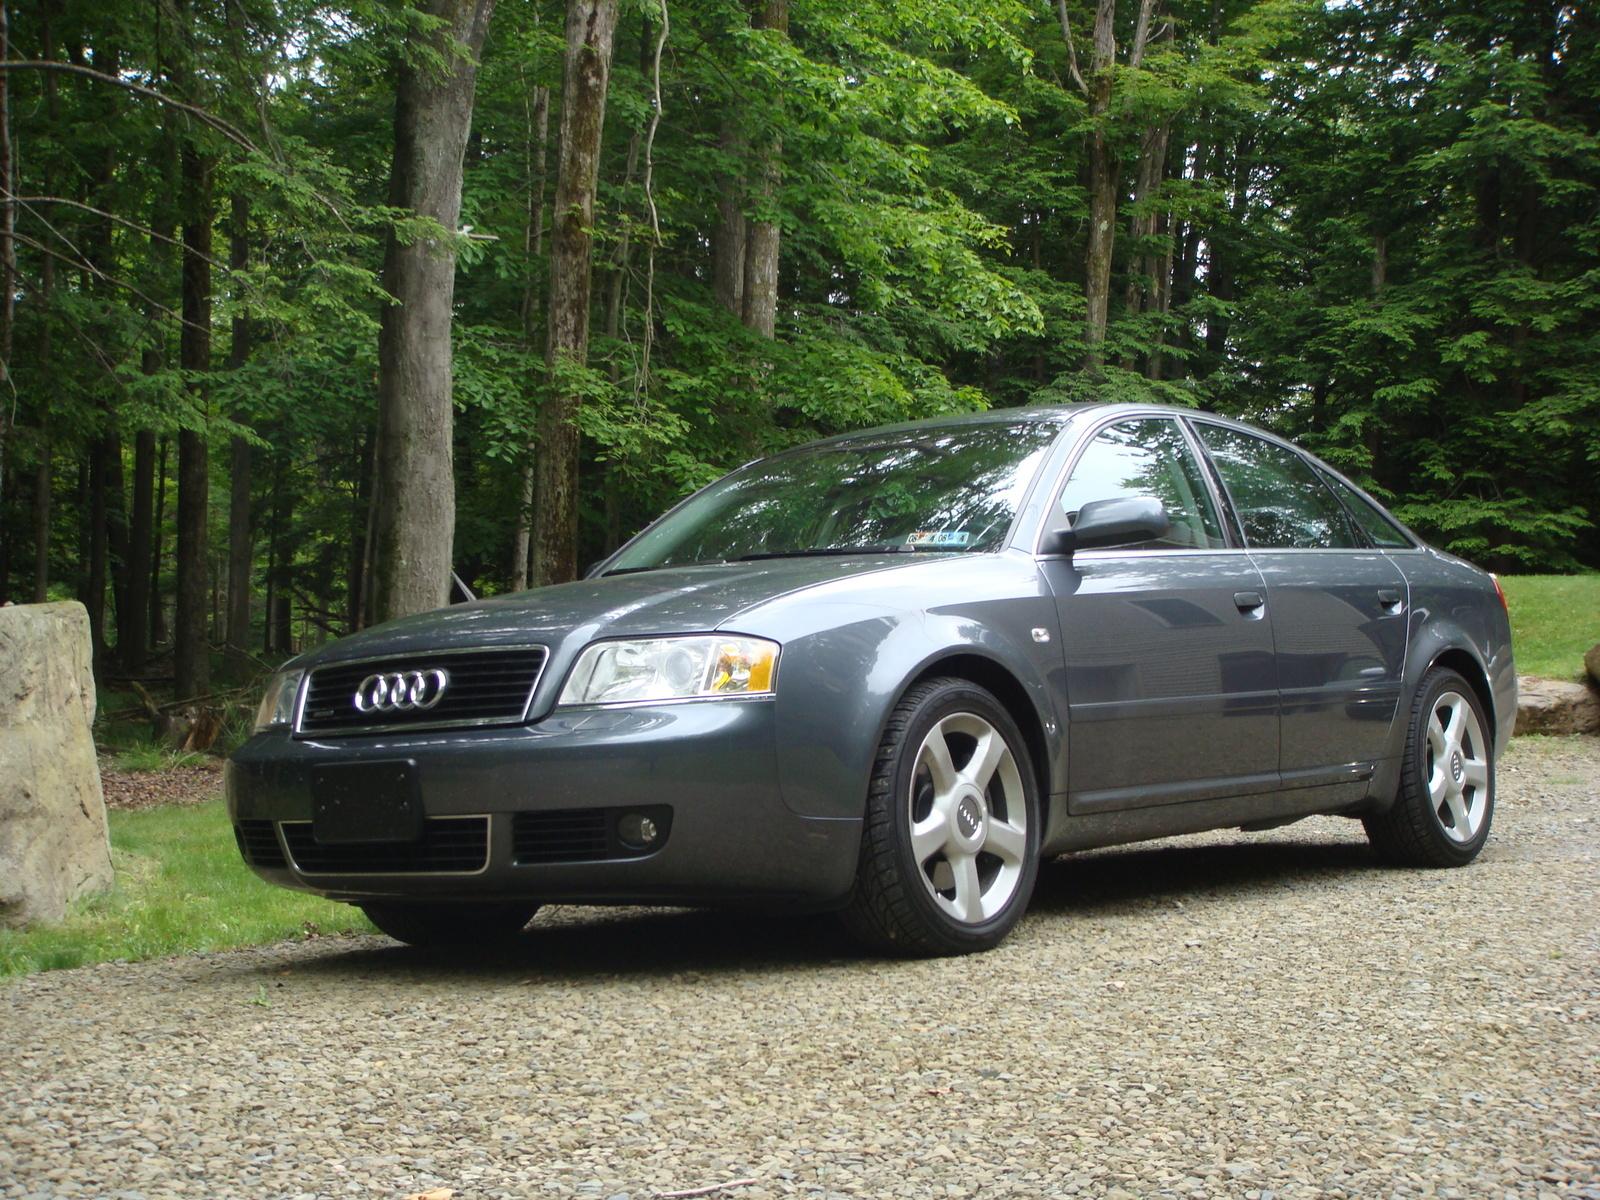 hight resolution of 2004 audi a6 2 7t quattro s line sedan awd 2004 audi a6 2 7